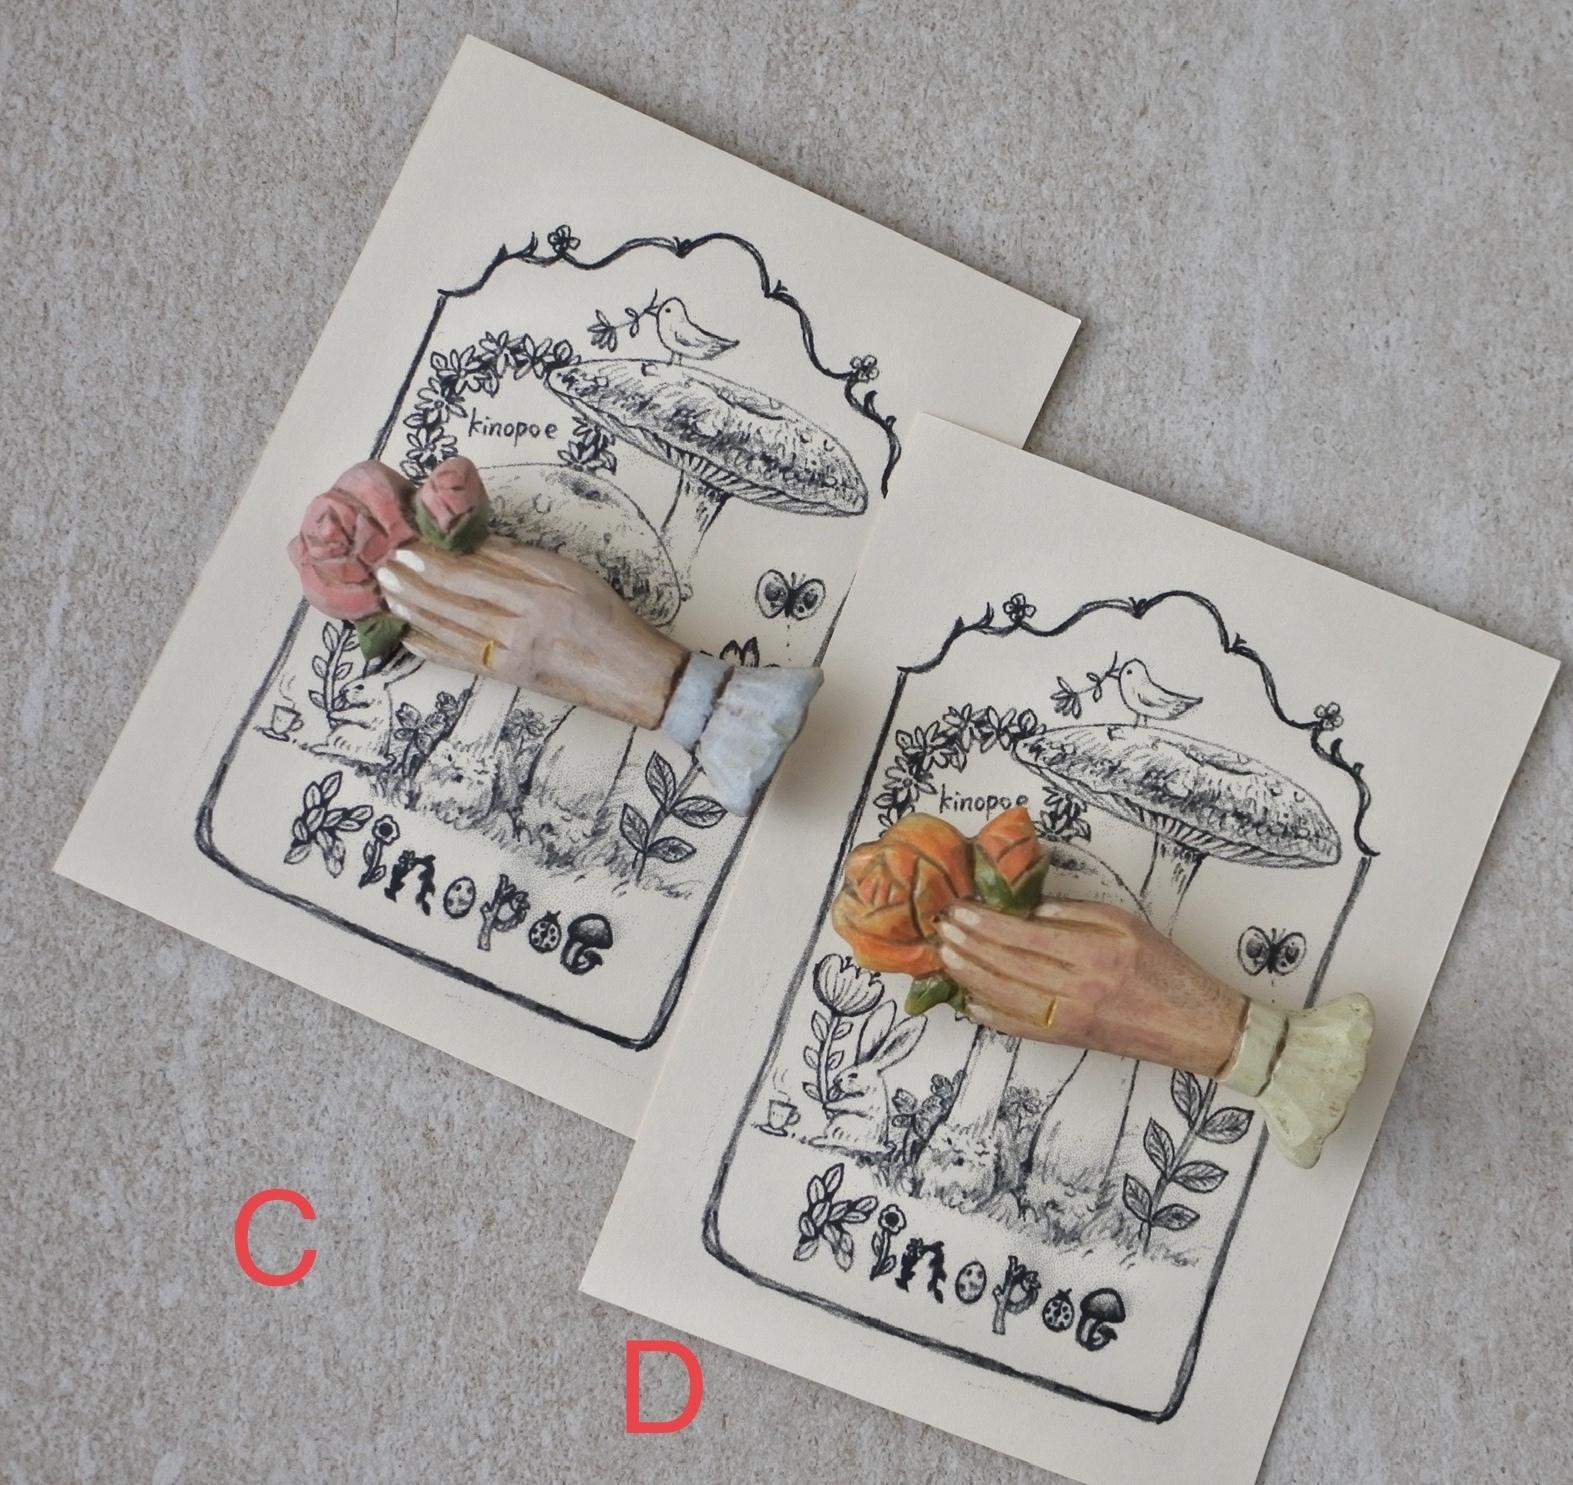 kinopoe /花hand ブローチ